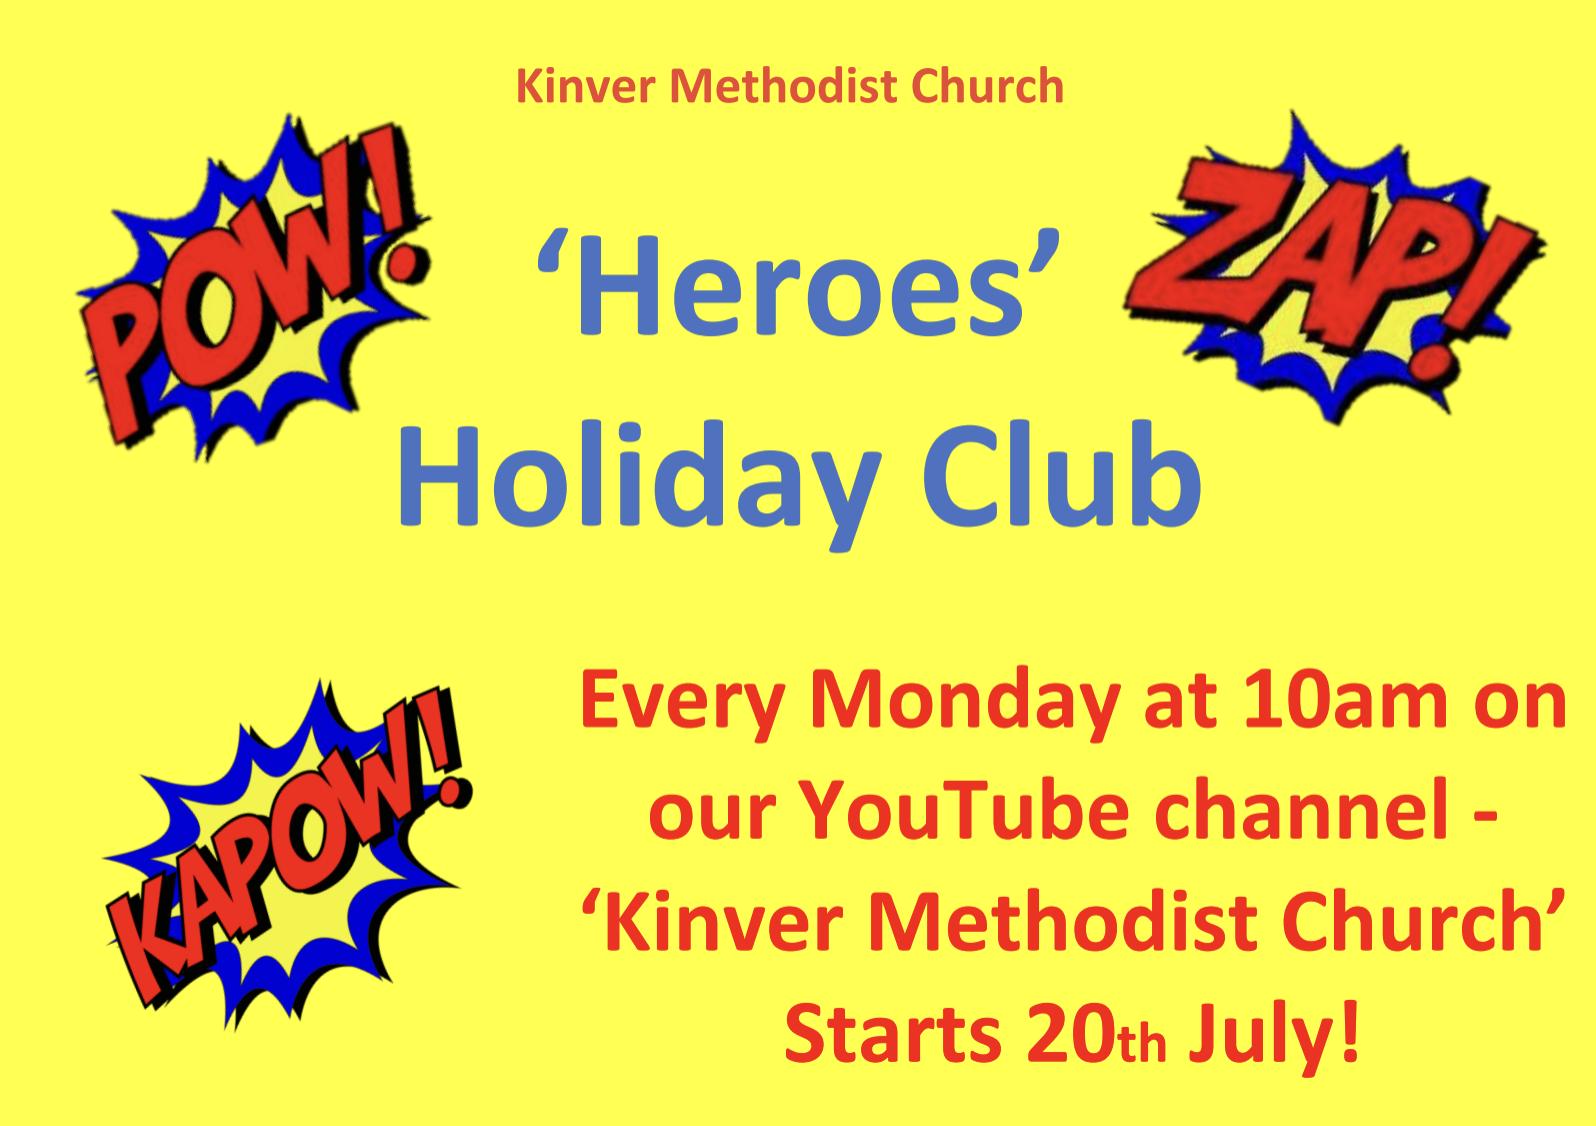 heroes holiday club